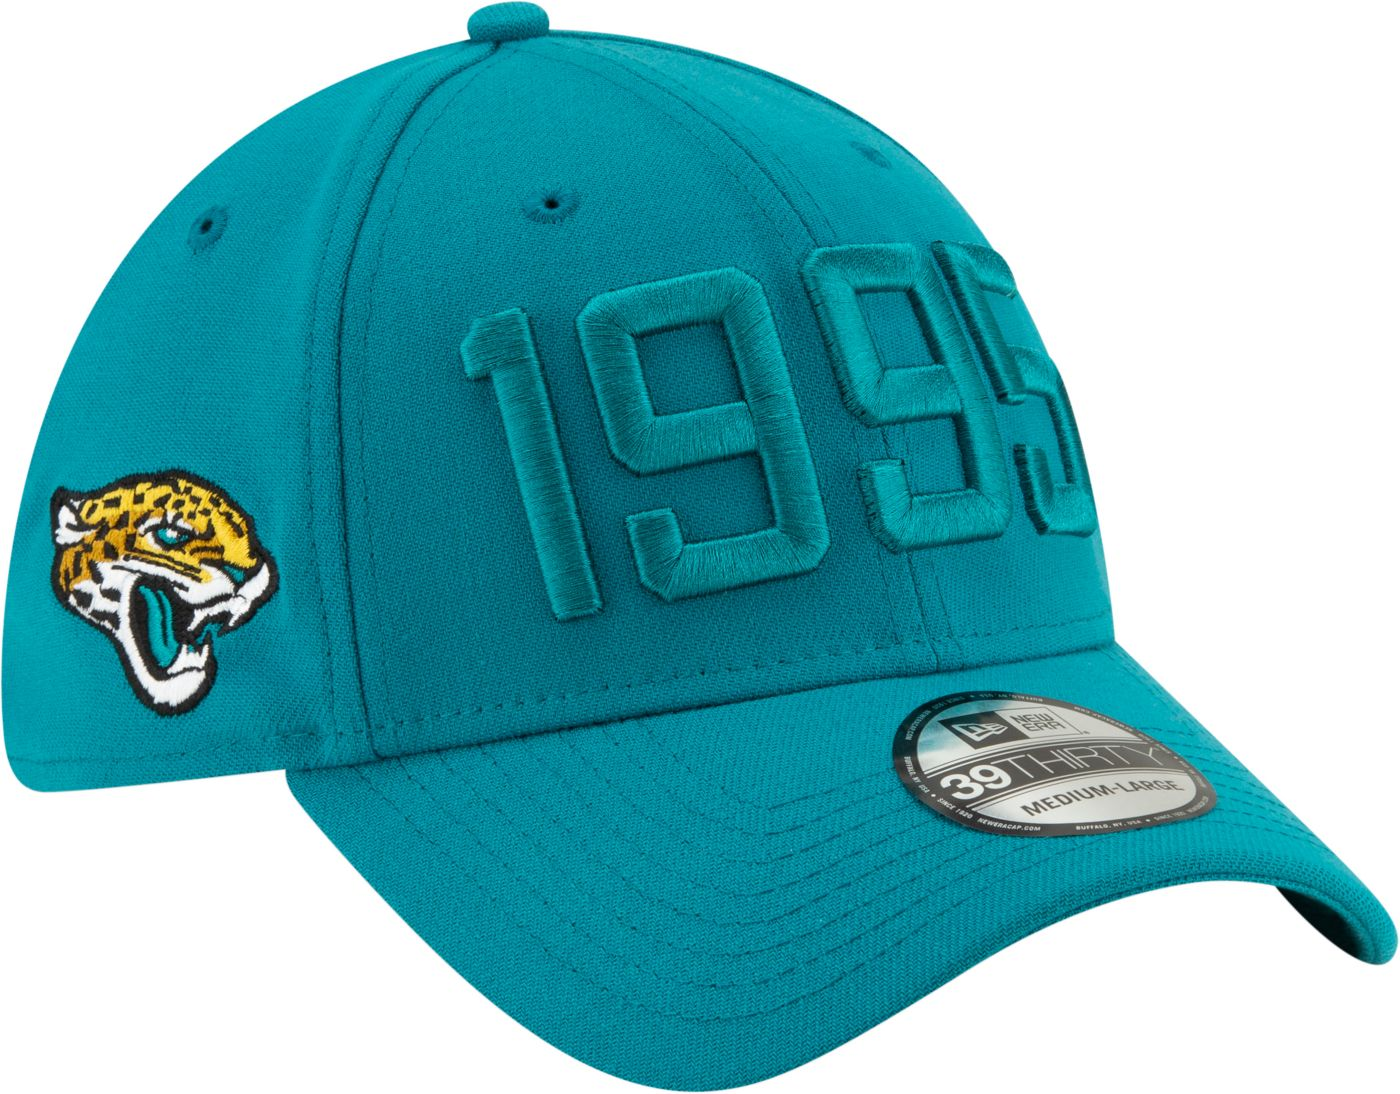 New Era Men's Jacksonville Jaguars Sideline Color Rush 39Thirty Stretch Fit Hat